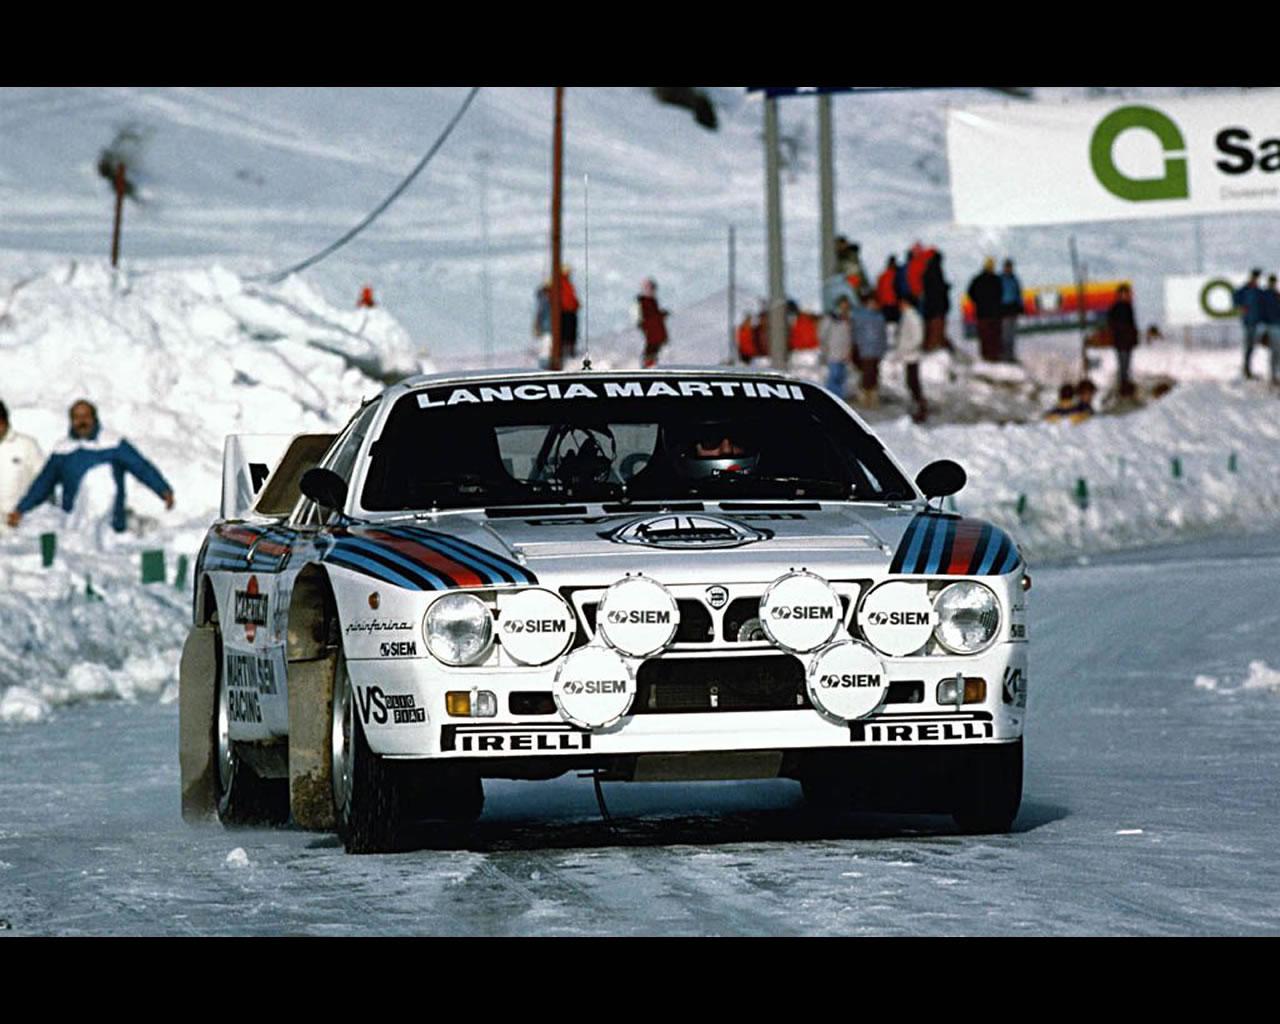 Lancia Beta Monte Carlo 037 Stradale Group 5 to Group B 1980 1984 1280x1024